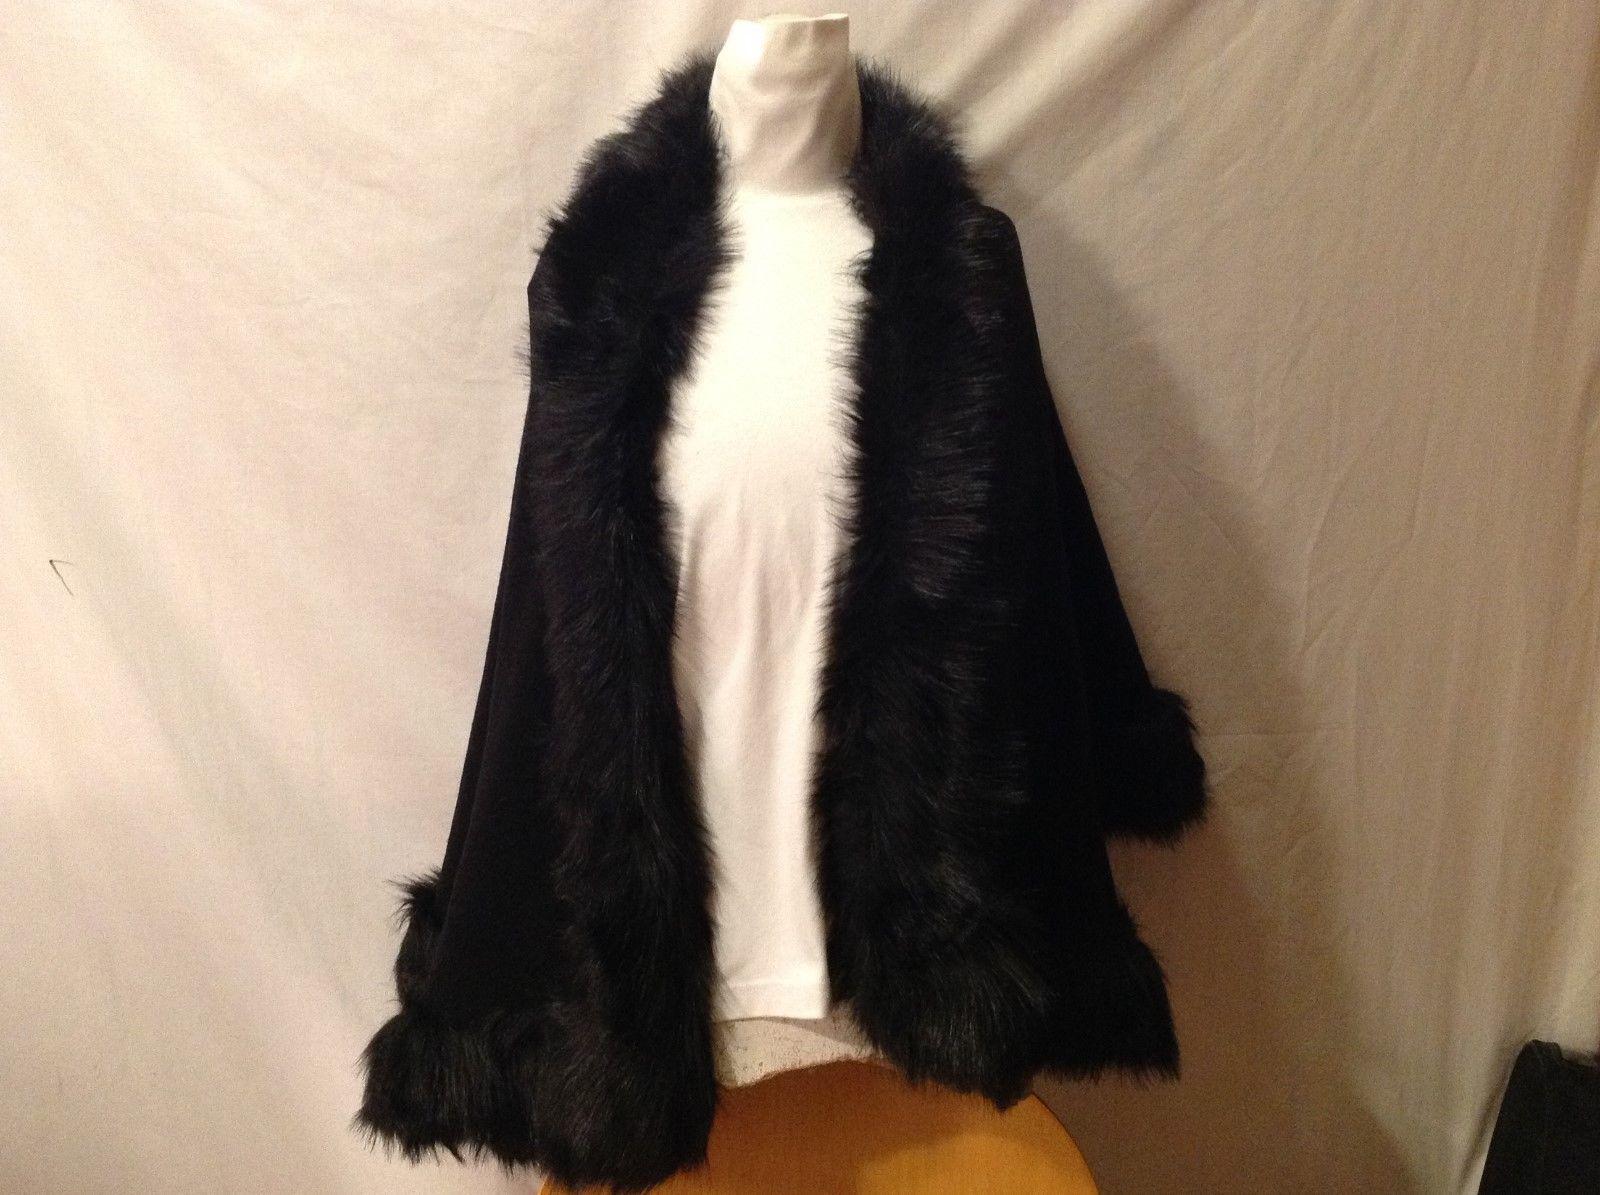 GORGEOUS Faux Fur Black Mink-Like Shawl/Cape/Drape